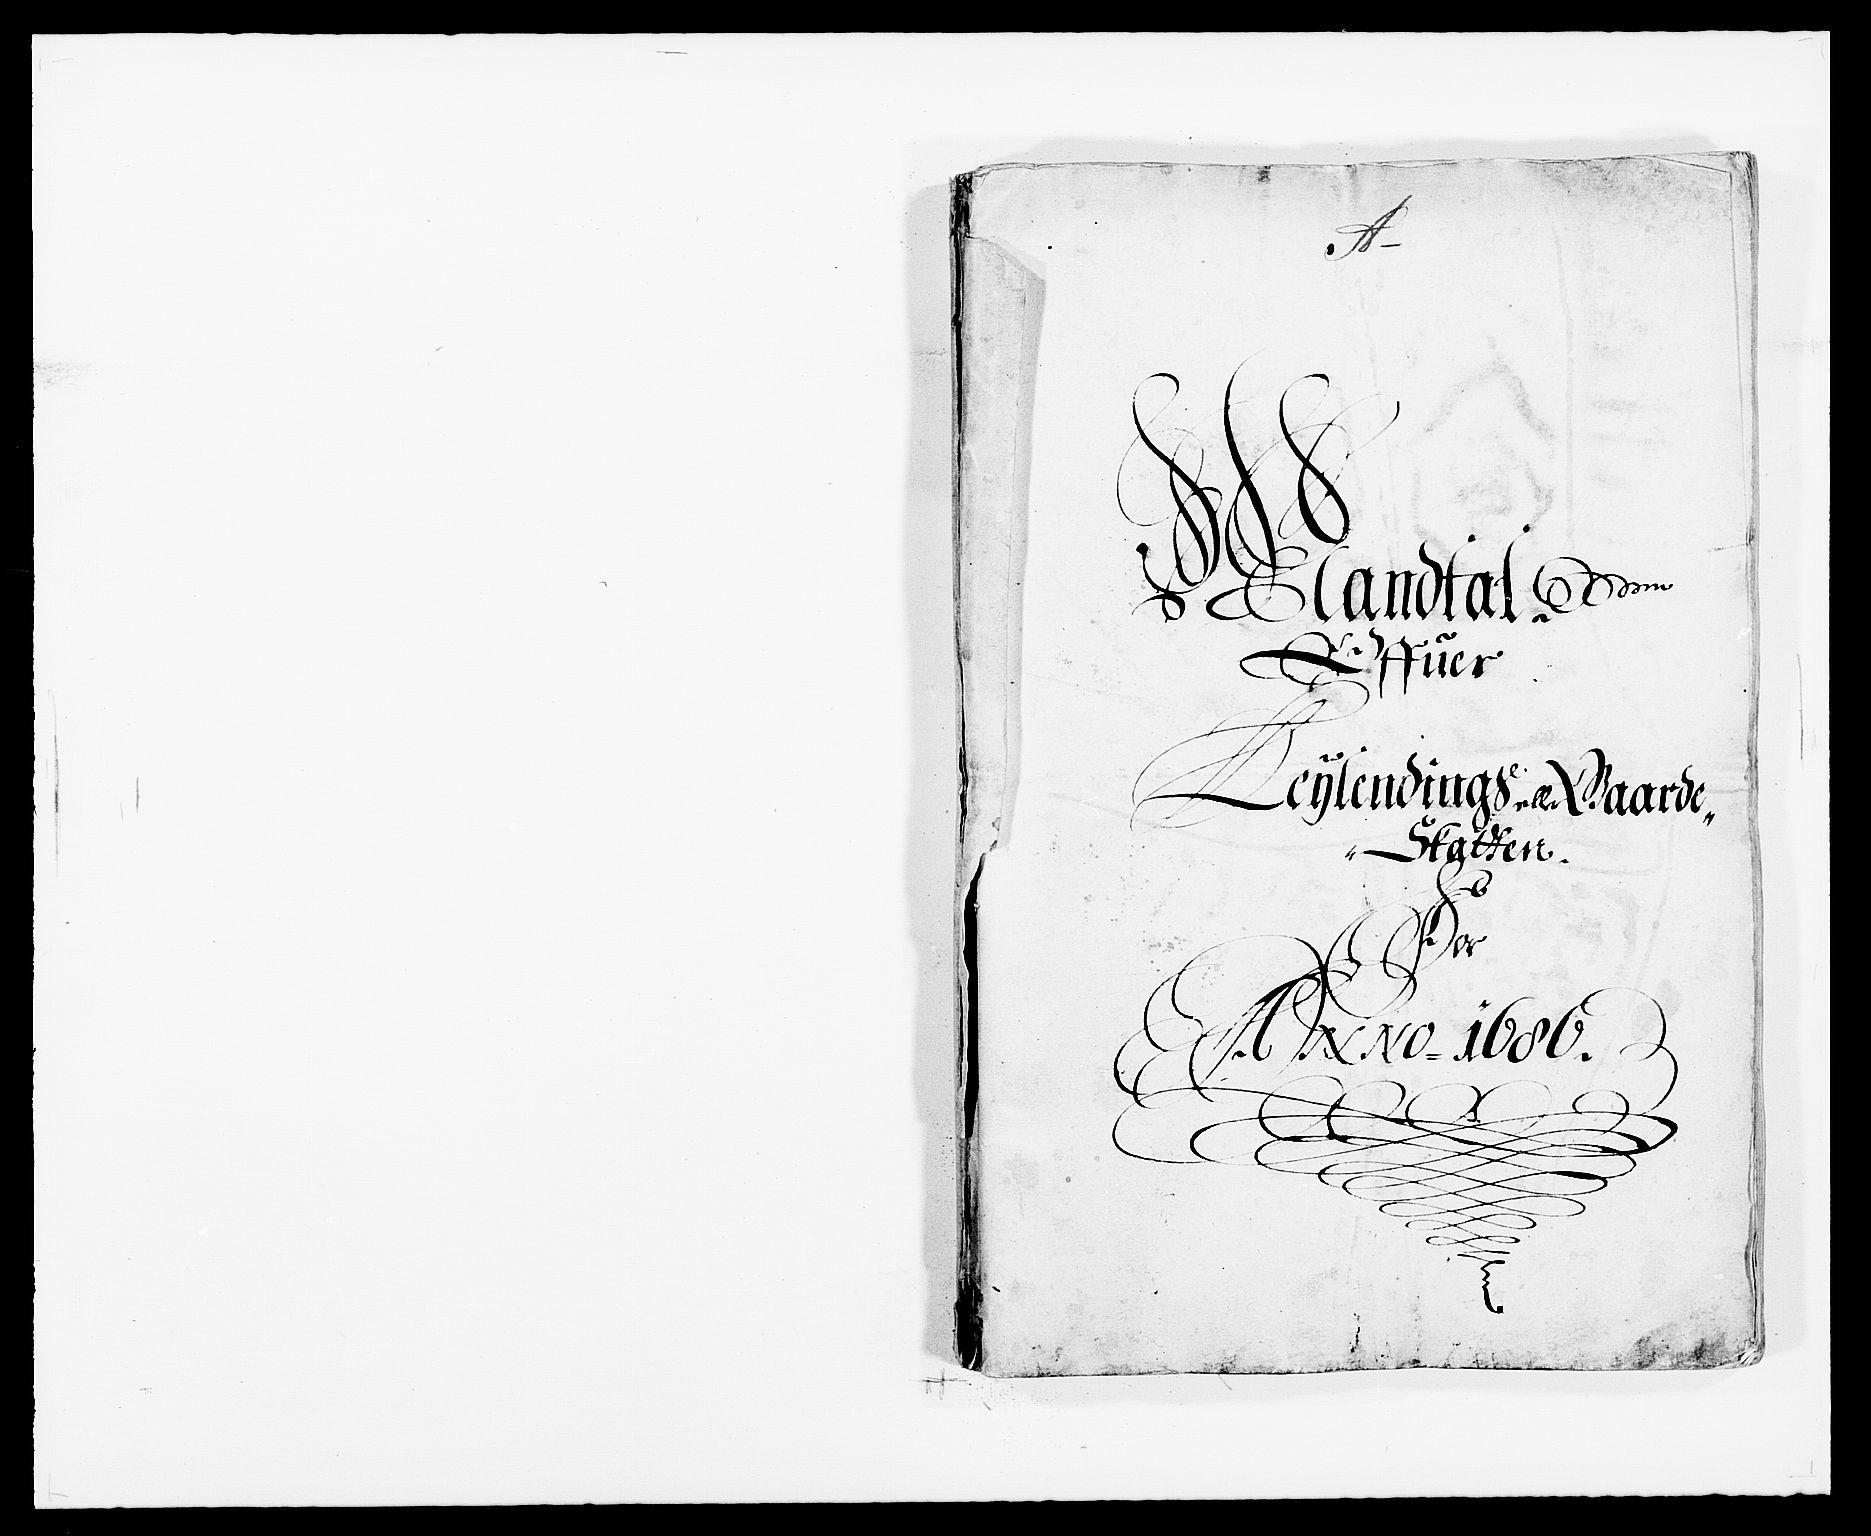 RA, Rentekammeret inntil 1814, Reviderte regnskaper, Fogderegnskap, R32/L1857: Fogderegnskap Jarlsberg grevskap, 1686-1690, s. 39